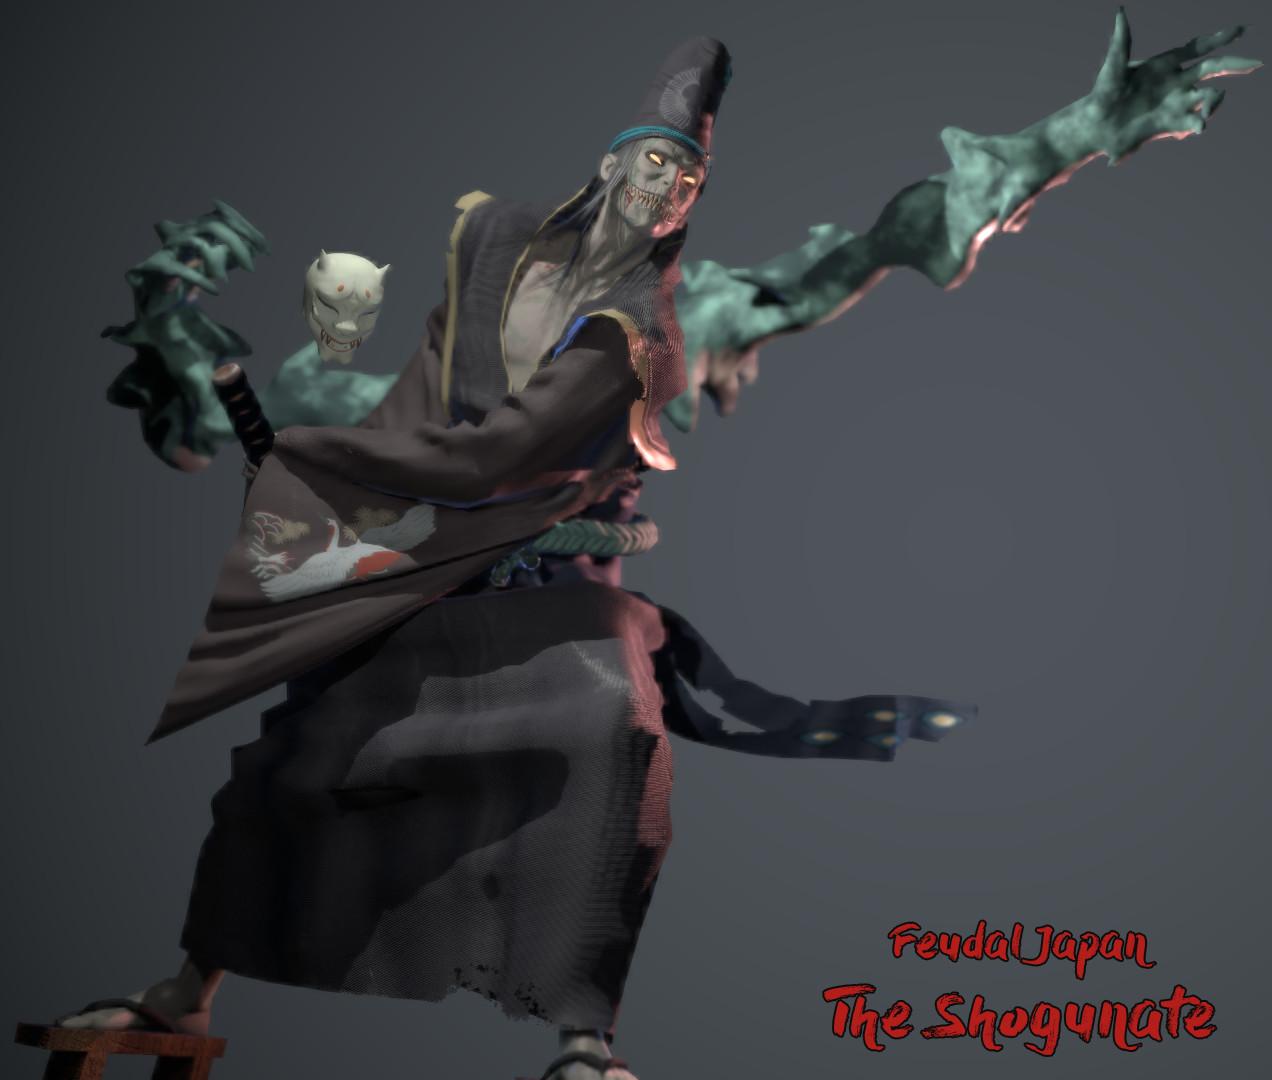 ArtStation Challenge - Feudal Japan: The Shogunate